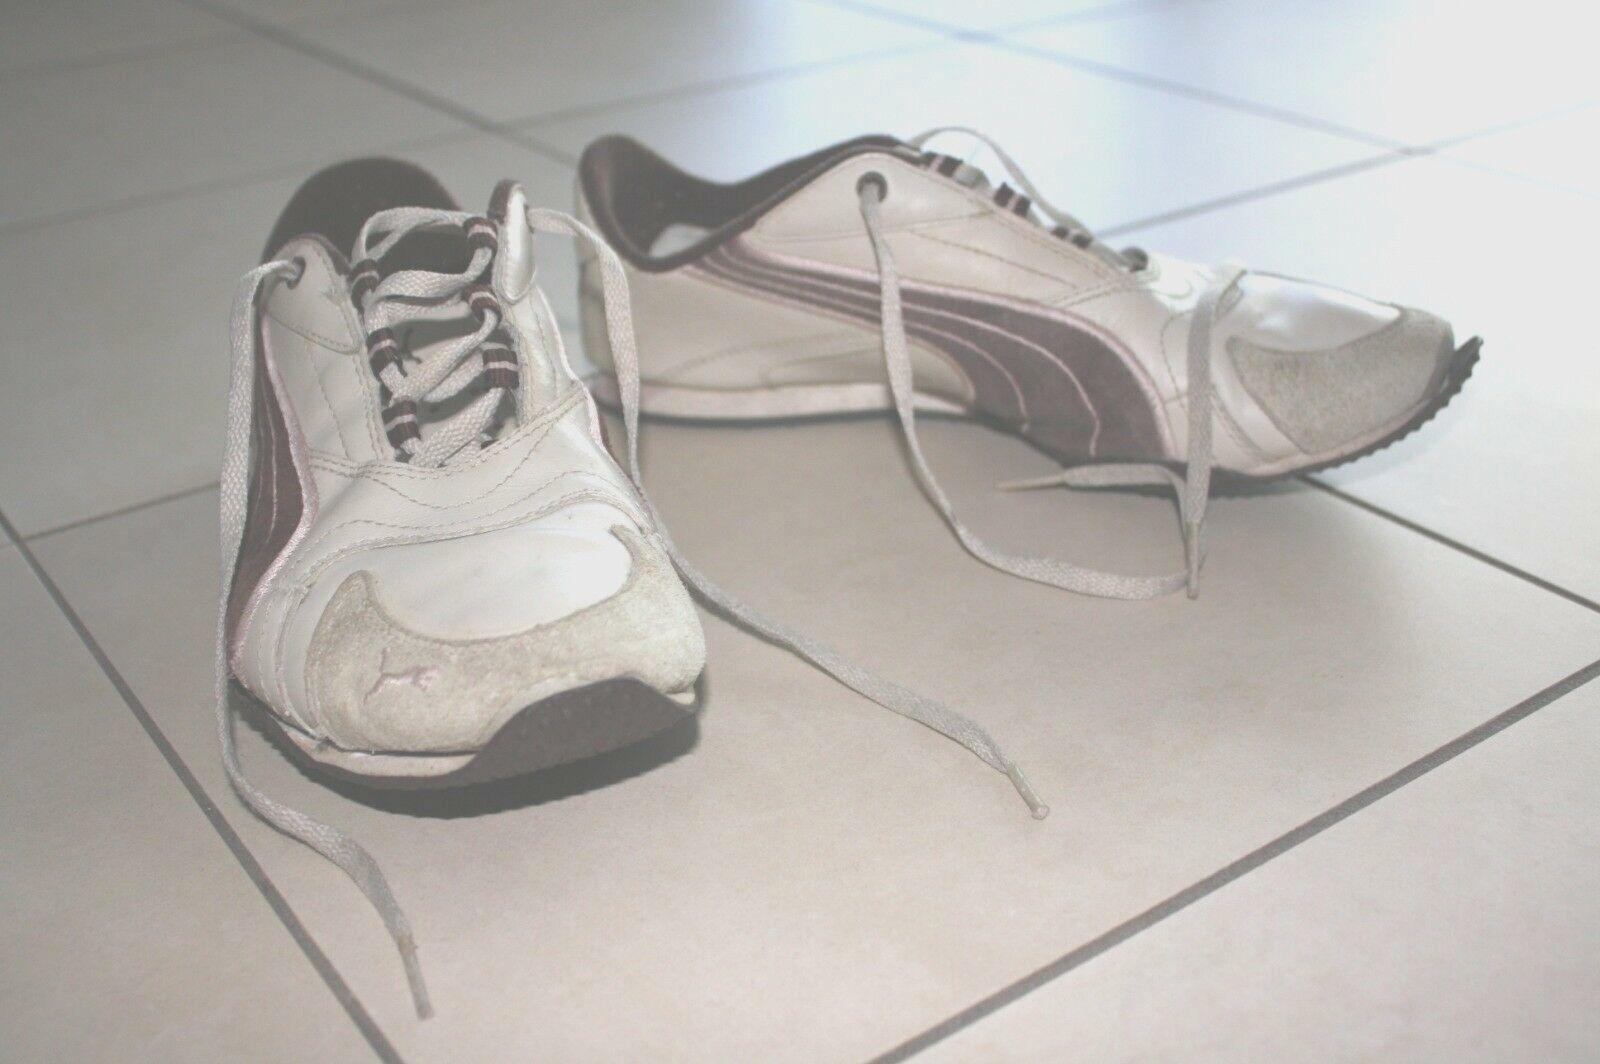 Puma Saloh Rare Women's Sports shoes Size UK 5.5 US'W 8 EUR 38.5 CM 24.5